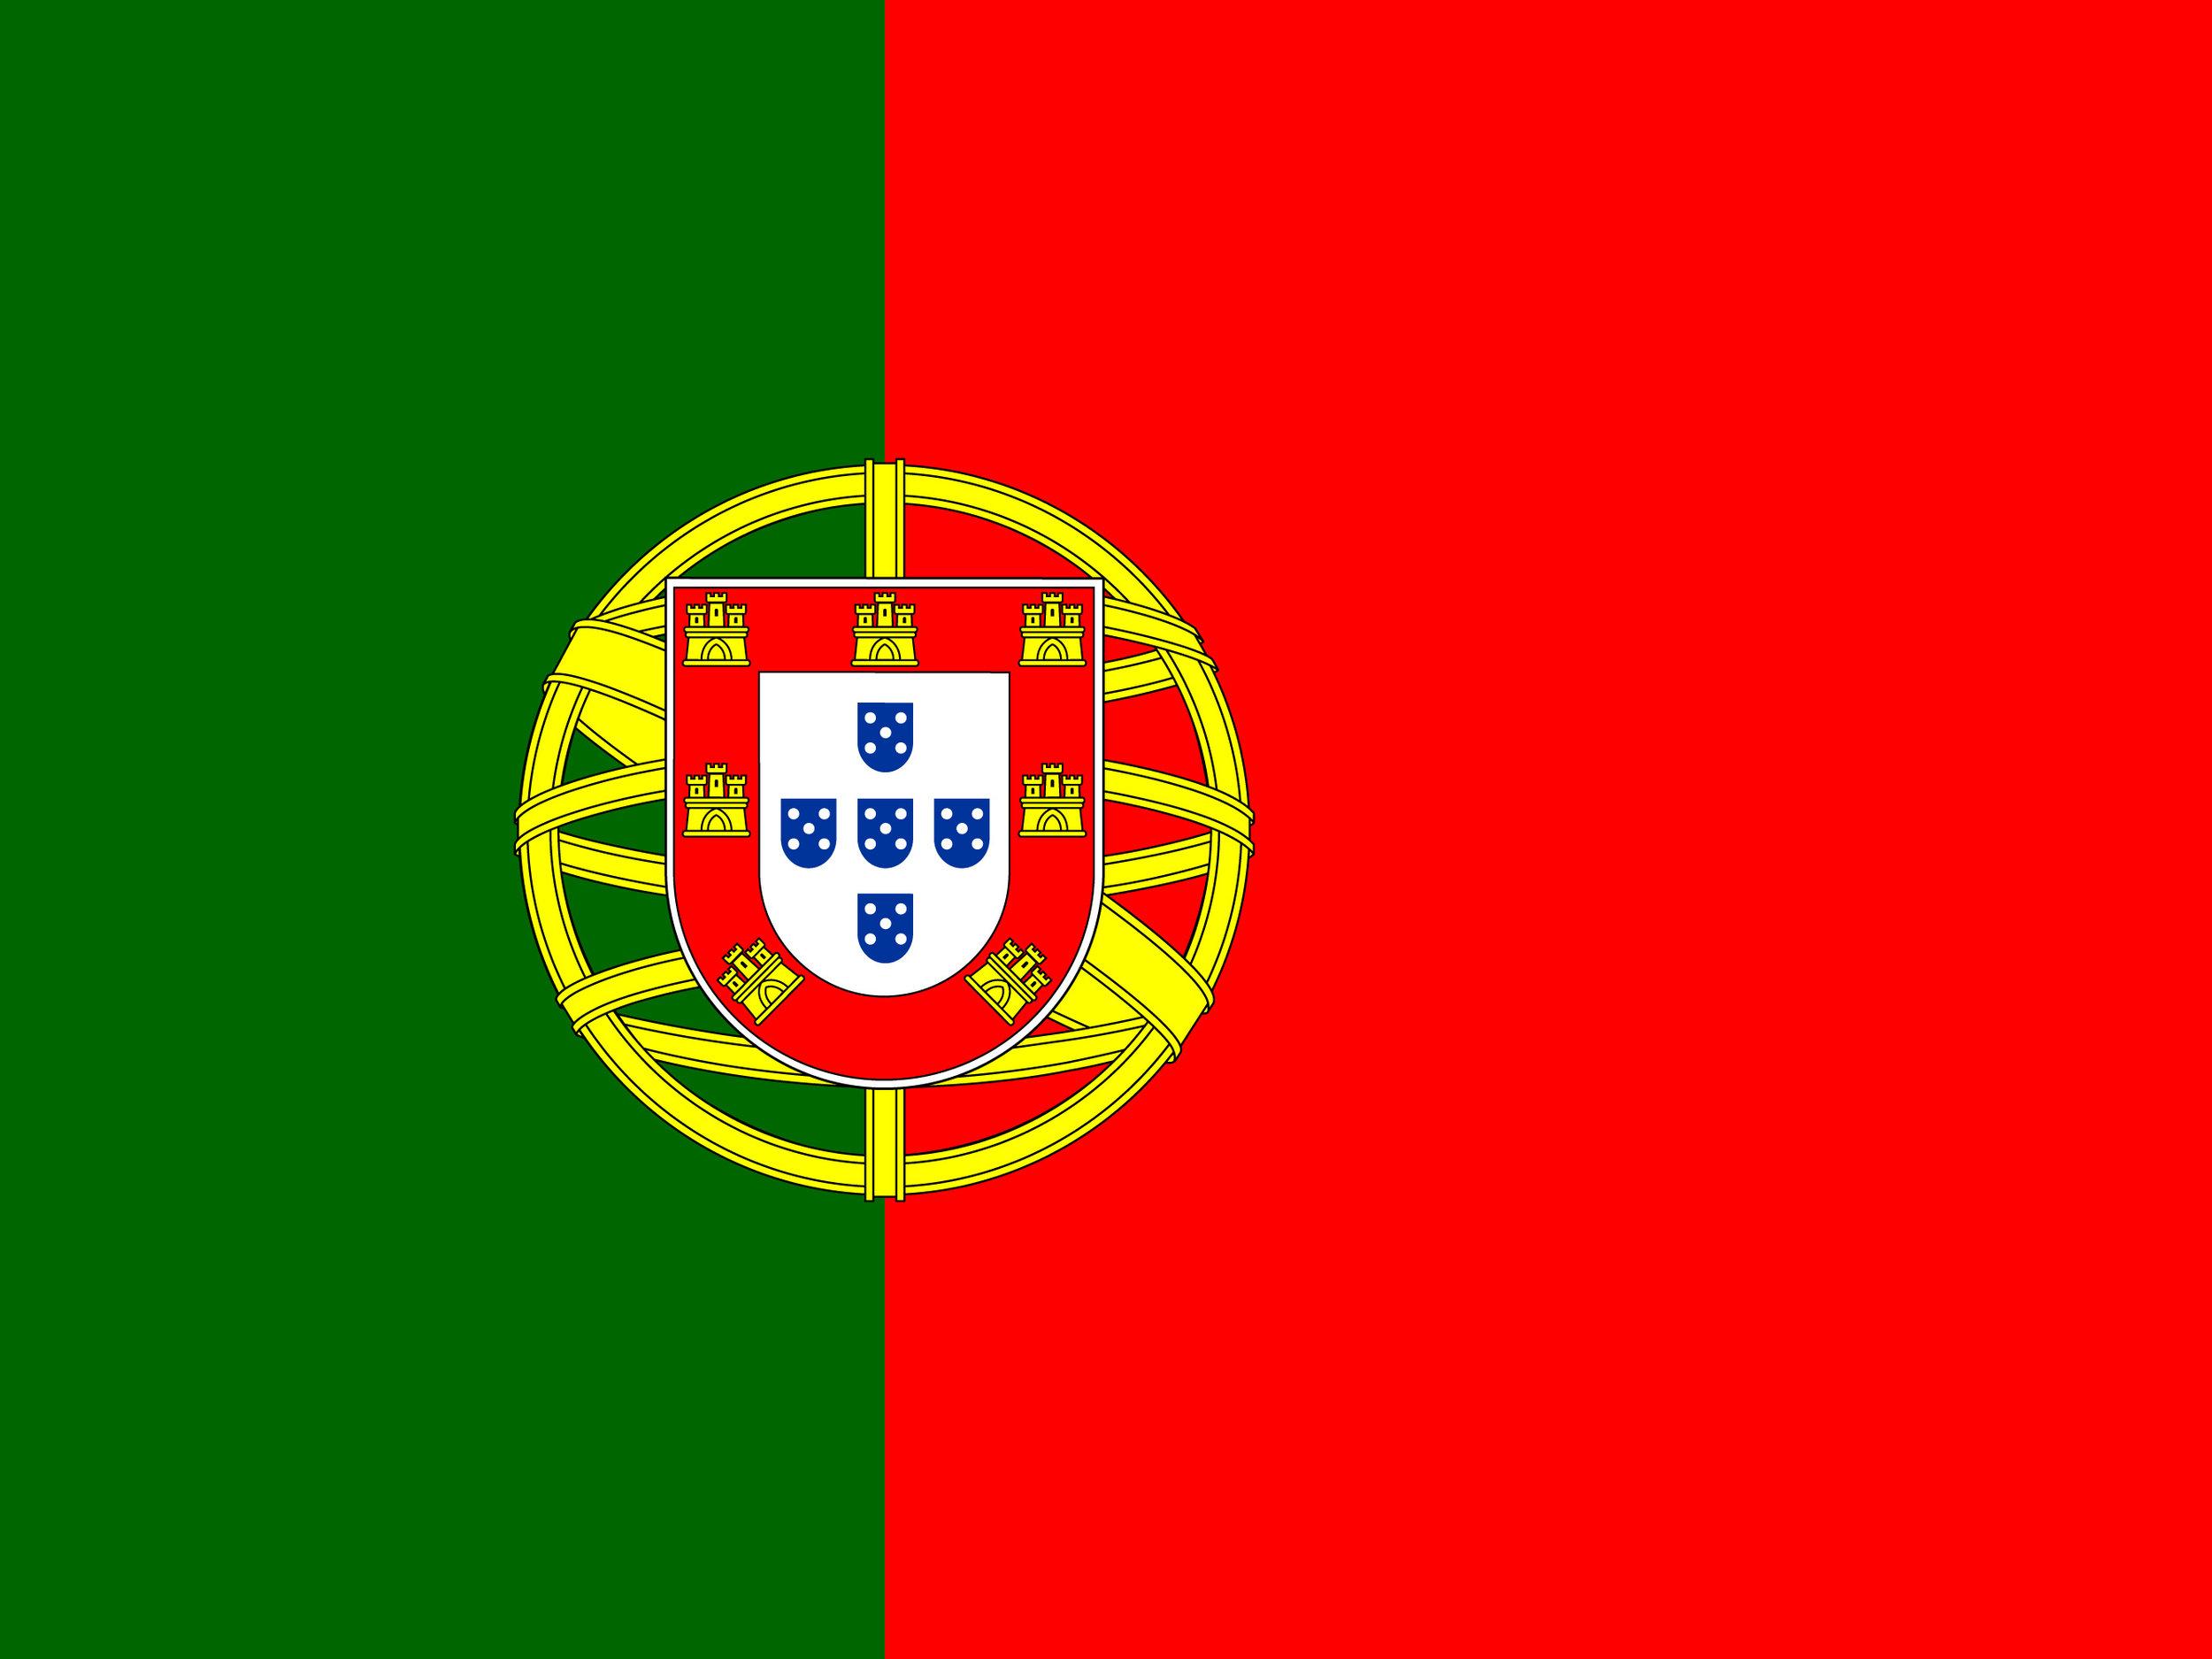 010-Portugal.jpg